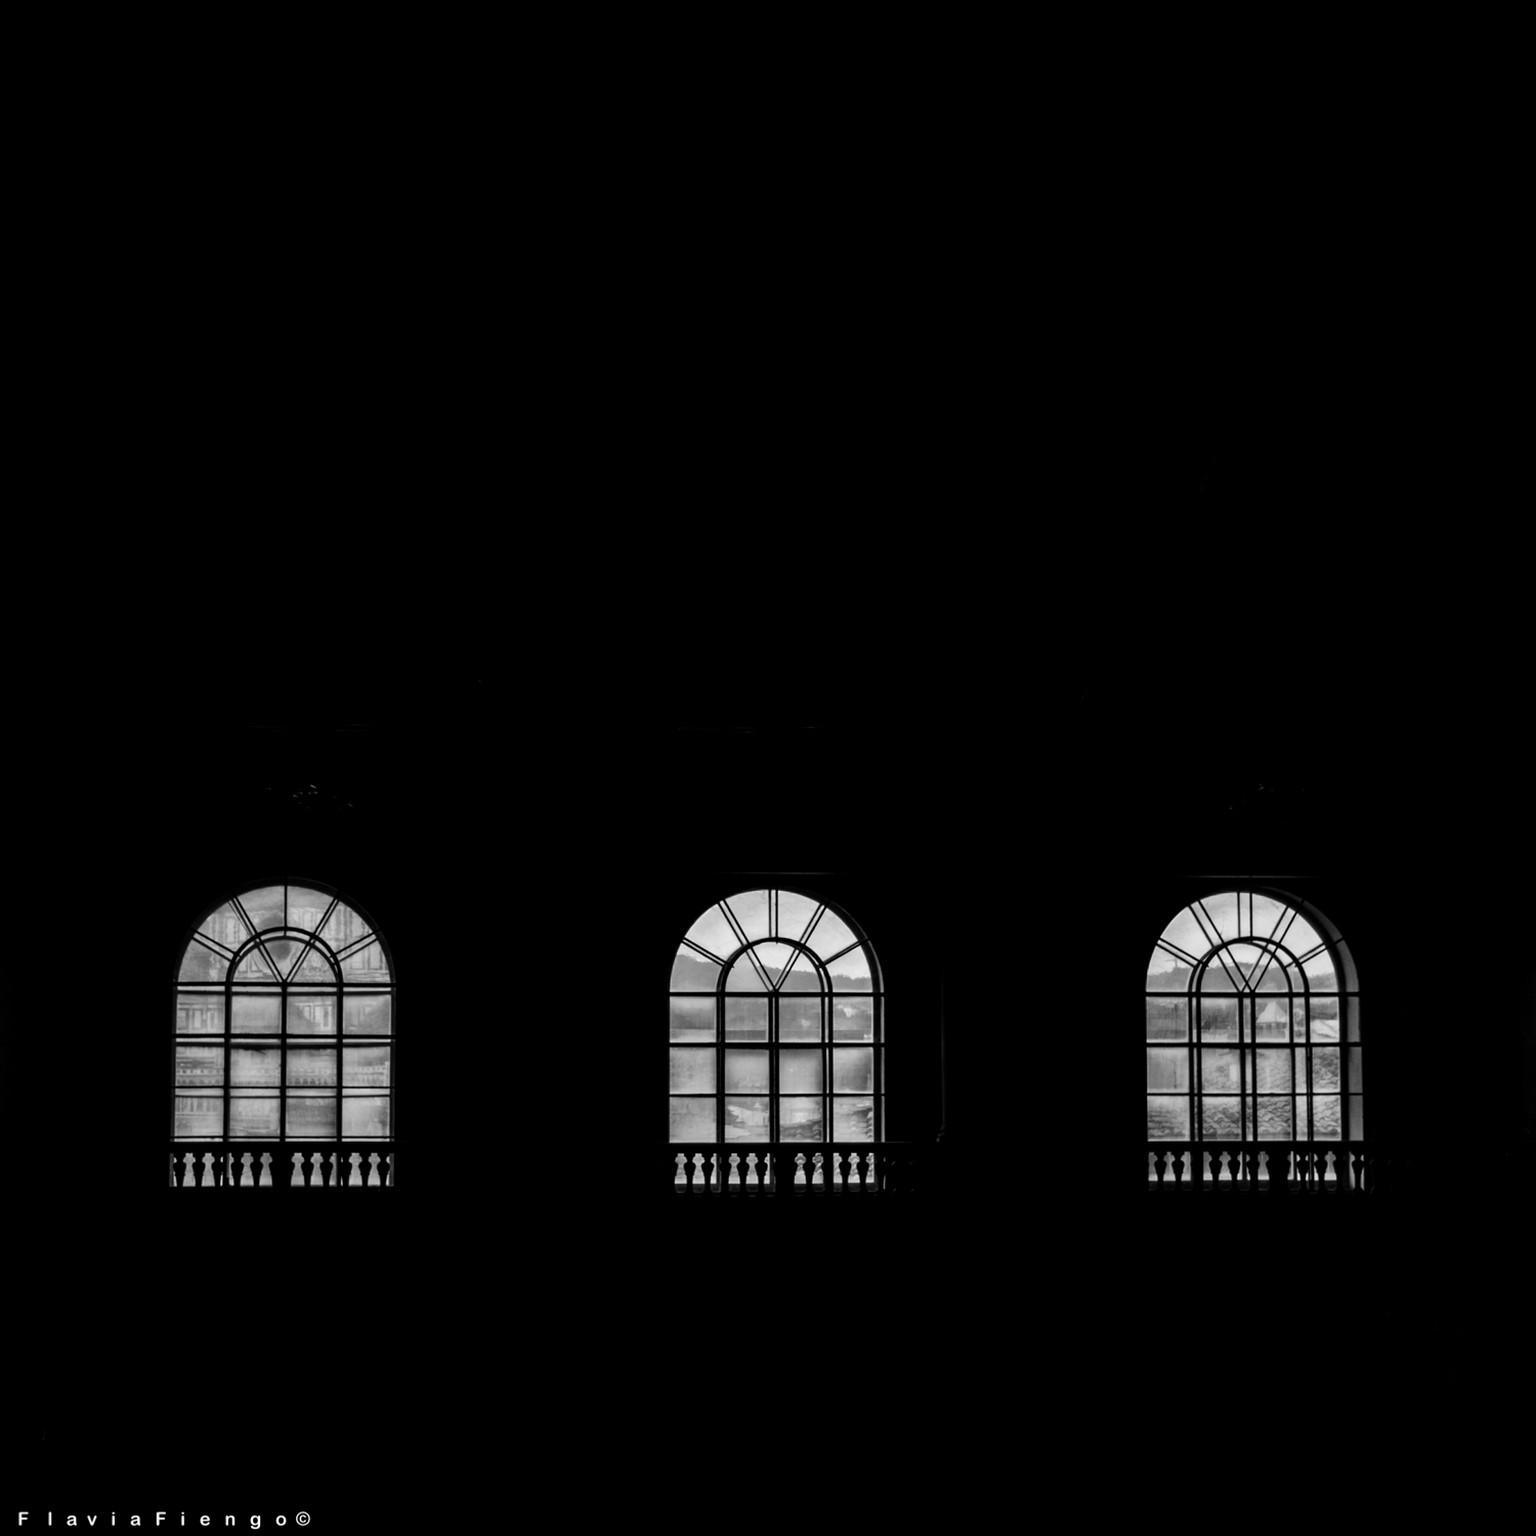 Flavia_Fiengo_Windows00011